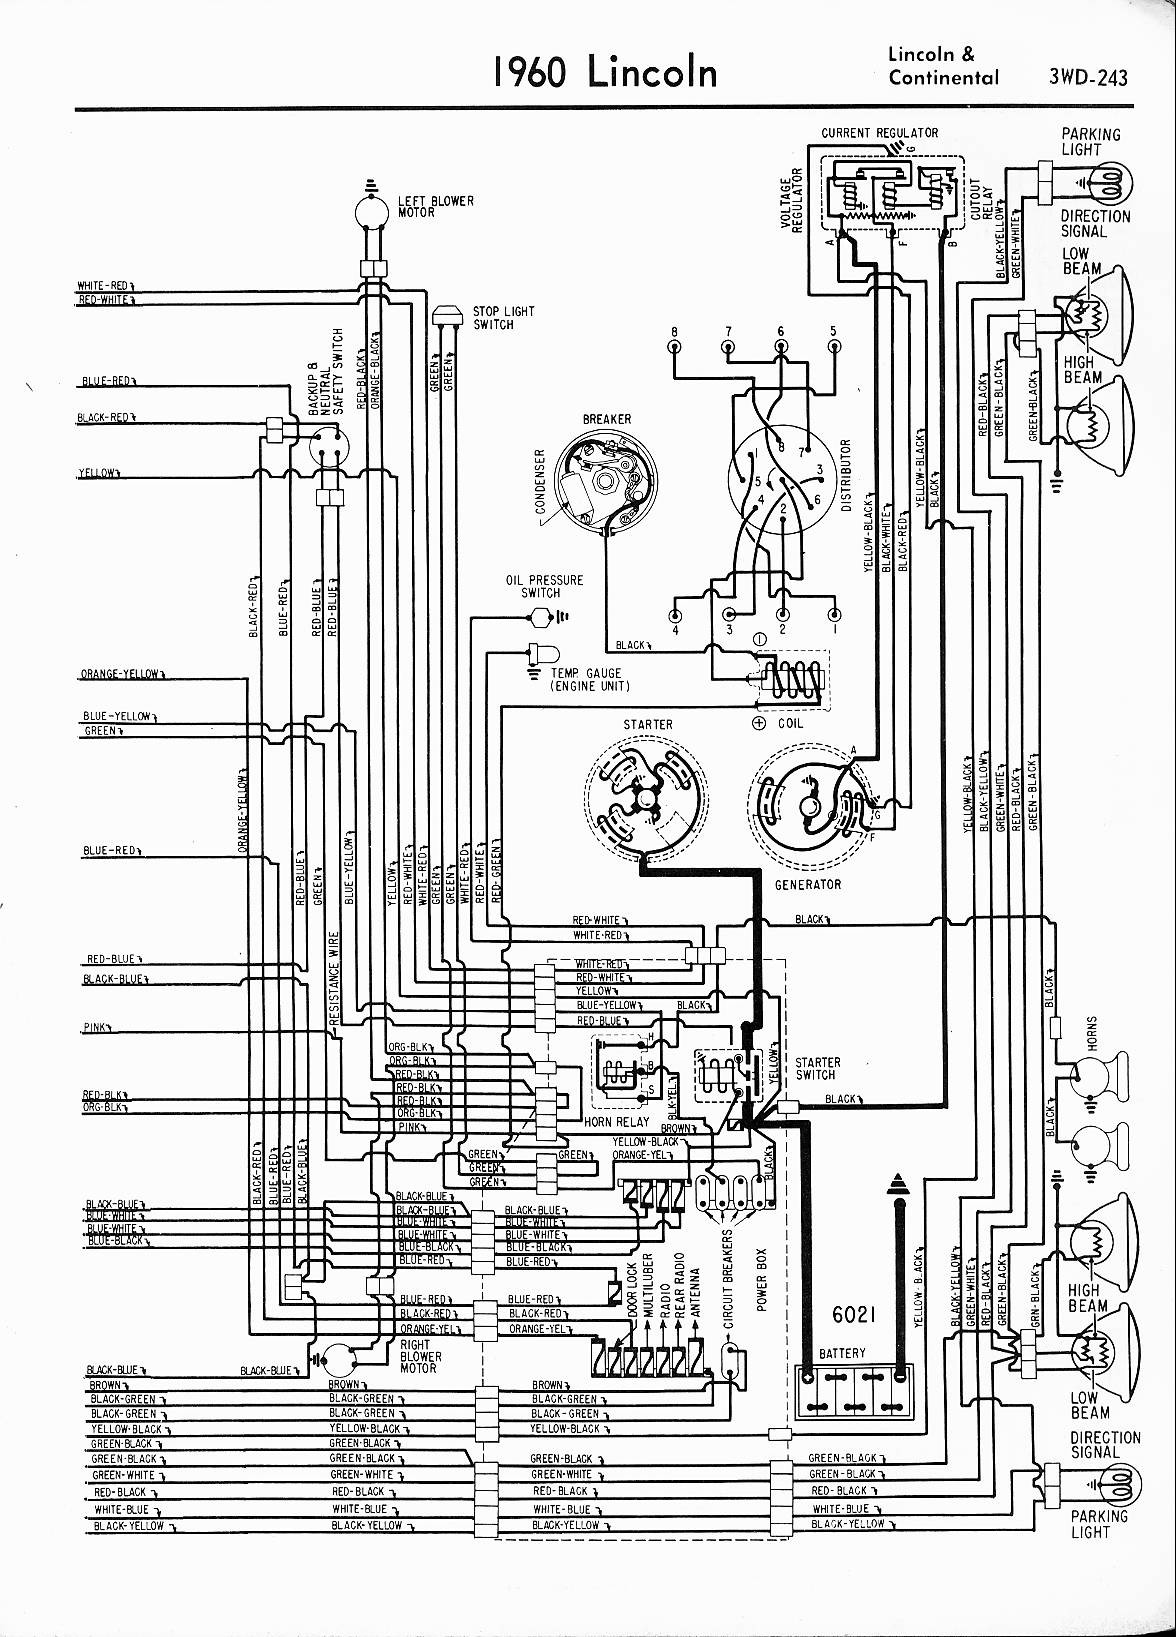 2003 Lincoln Navigator Engine Diagram 1966 Lincoln Wiring Diagram Content Resource Wiring Diagram • Of 2003 Lincoln Navigator Engine Diagram